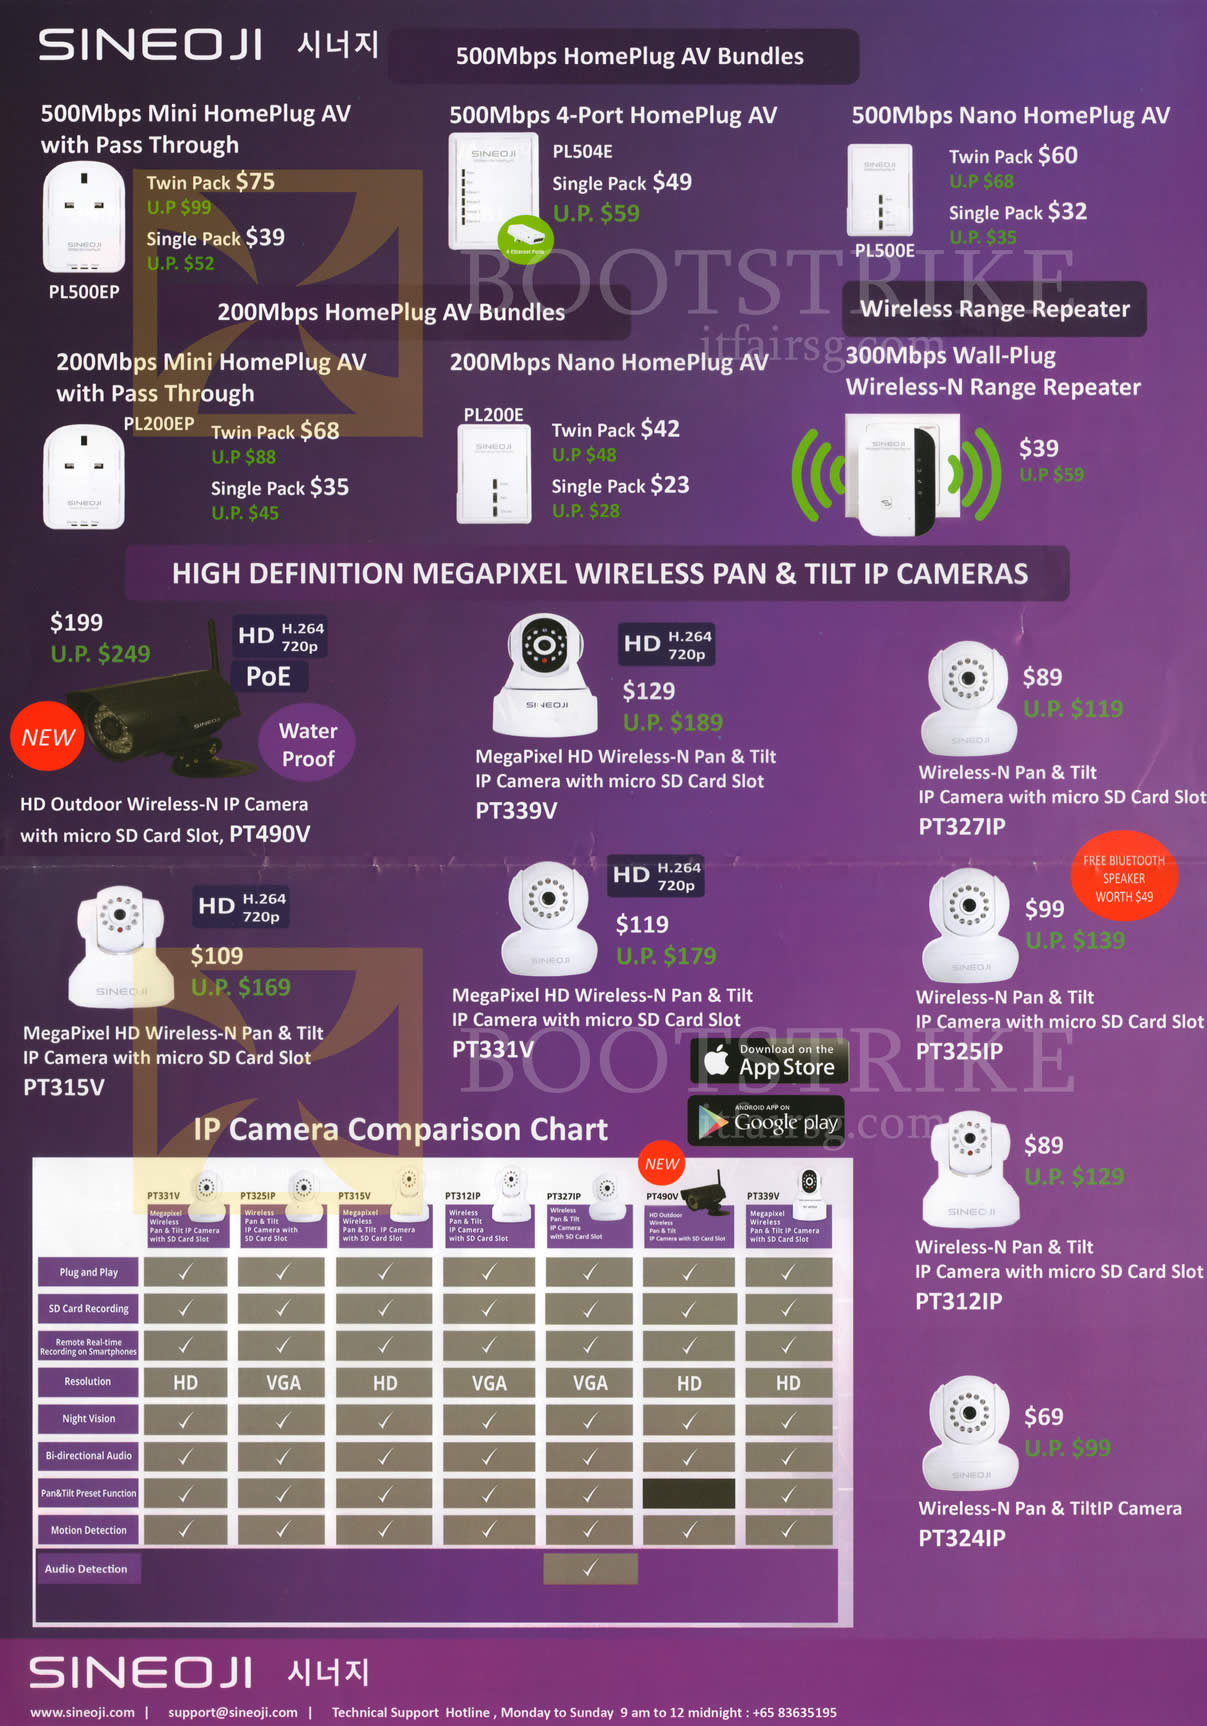 SITEX 2014 price list image brochure of Sineoji Networking HomePlugs, N-Range Repeaters, IP Cameras, IPCam Comparison Chart, PL500EP, PL504E, PL500E, PT339V, PT327IP